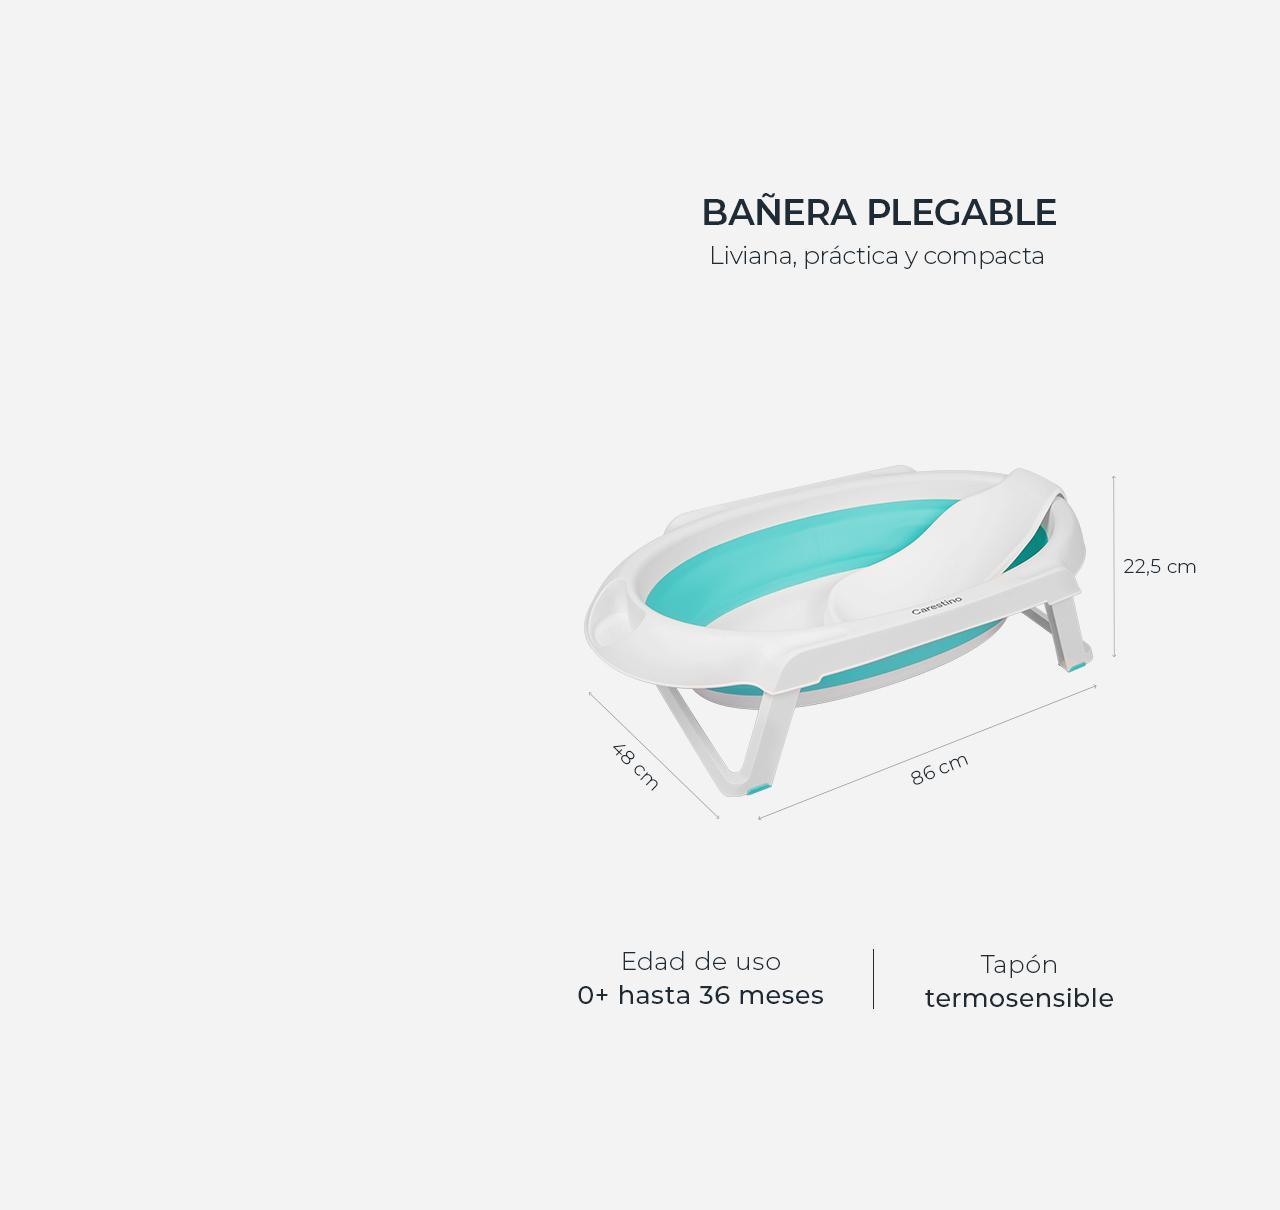 Bañera Plegable con Soporte Aguamarina imagen 11